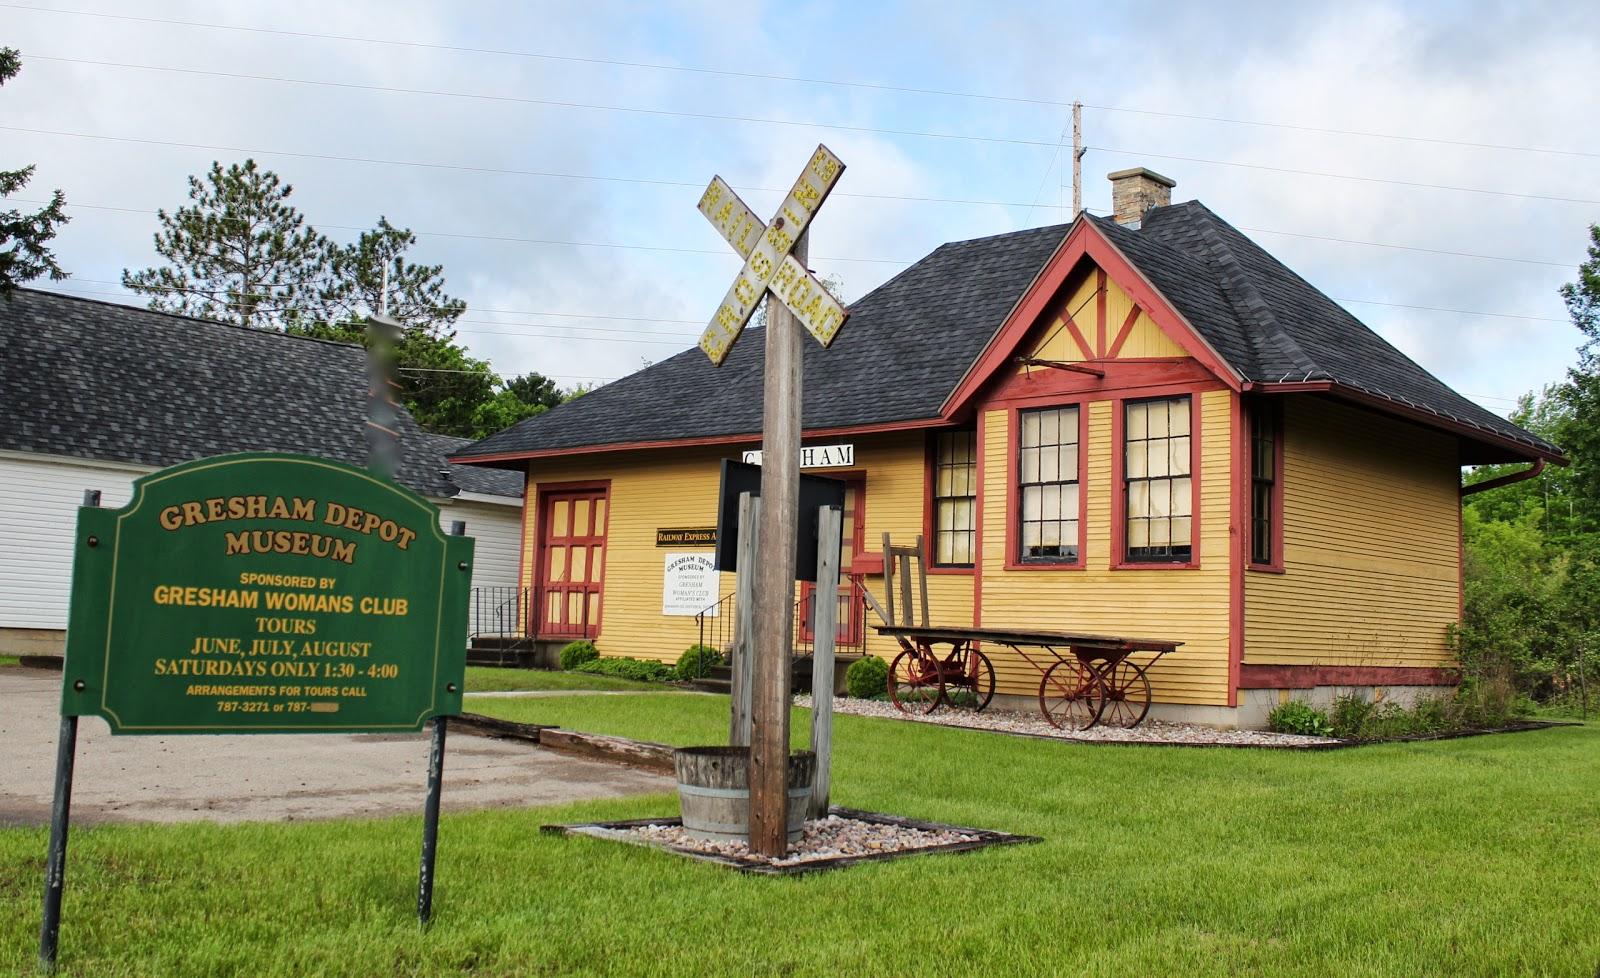 Wisconsin Historical Markers: Gresham Depot Museum